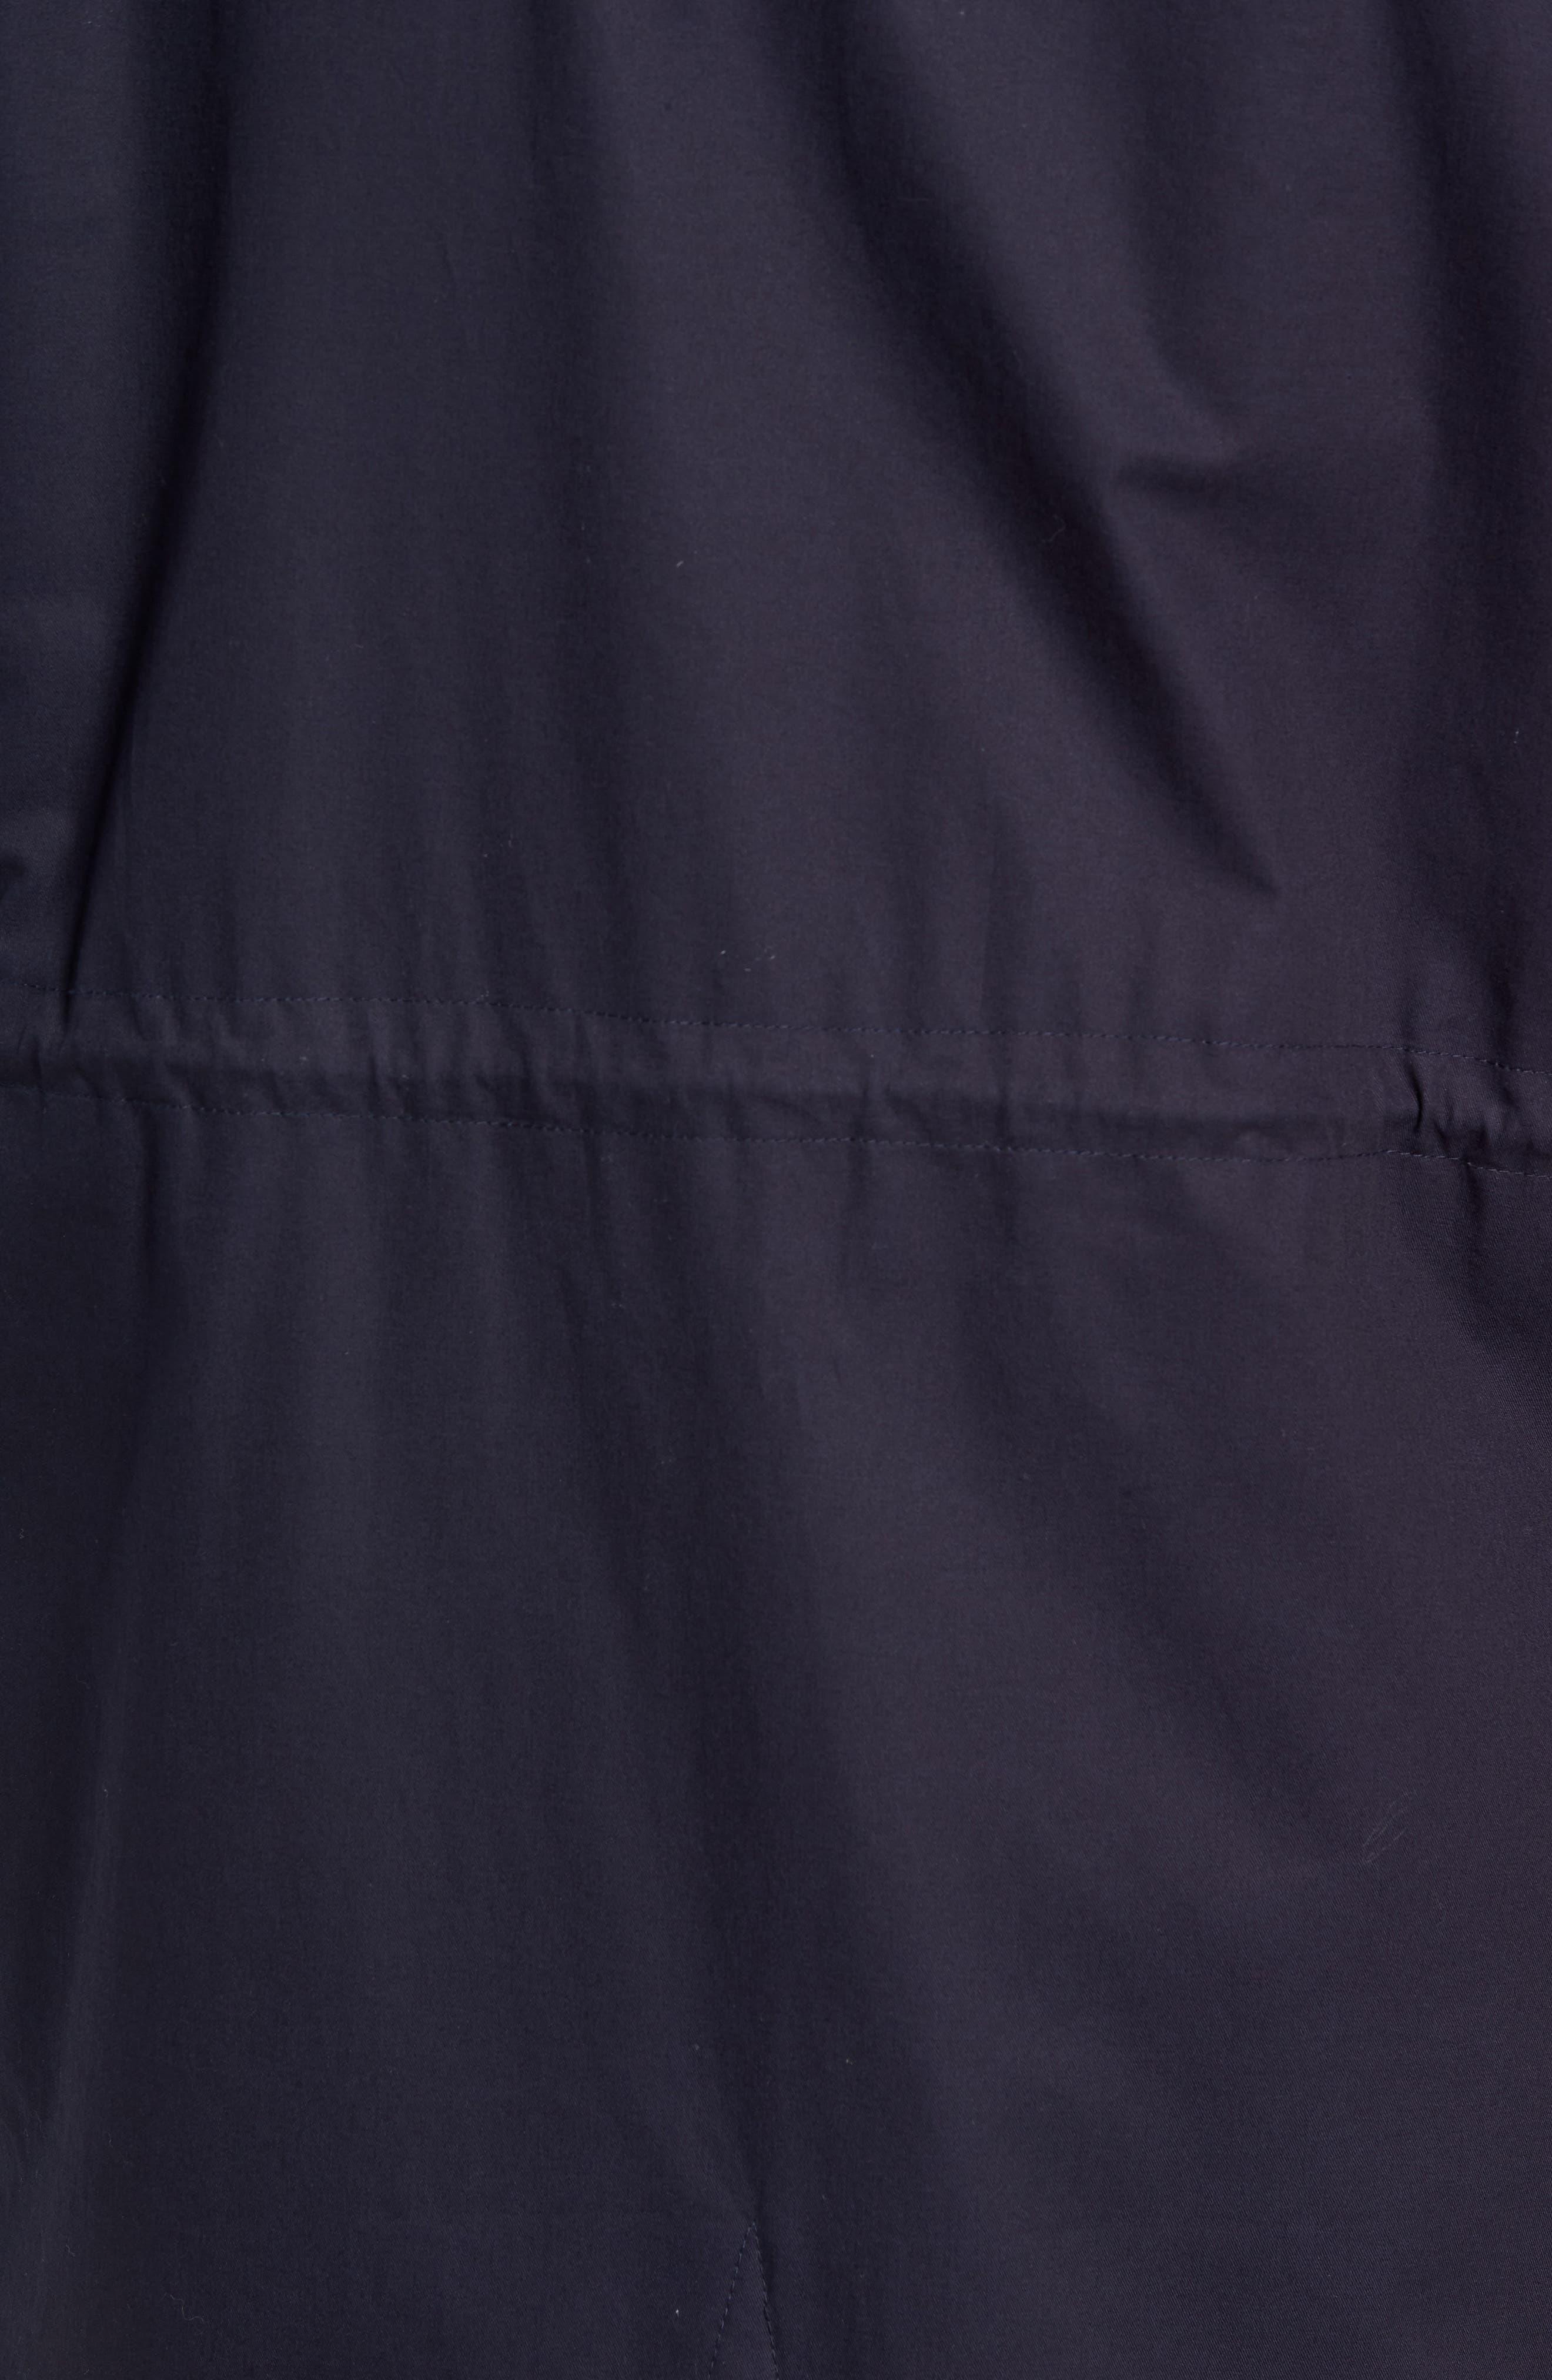 Fleece Lined Hooded Parka,                             Alternate thumbnail 6, color,                             NAVY